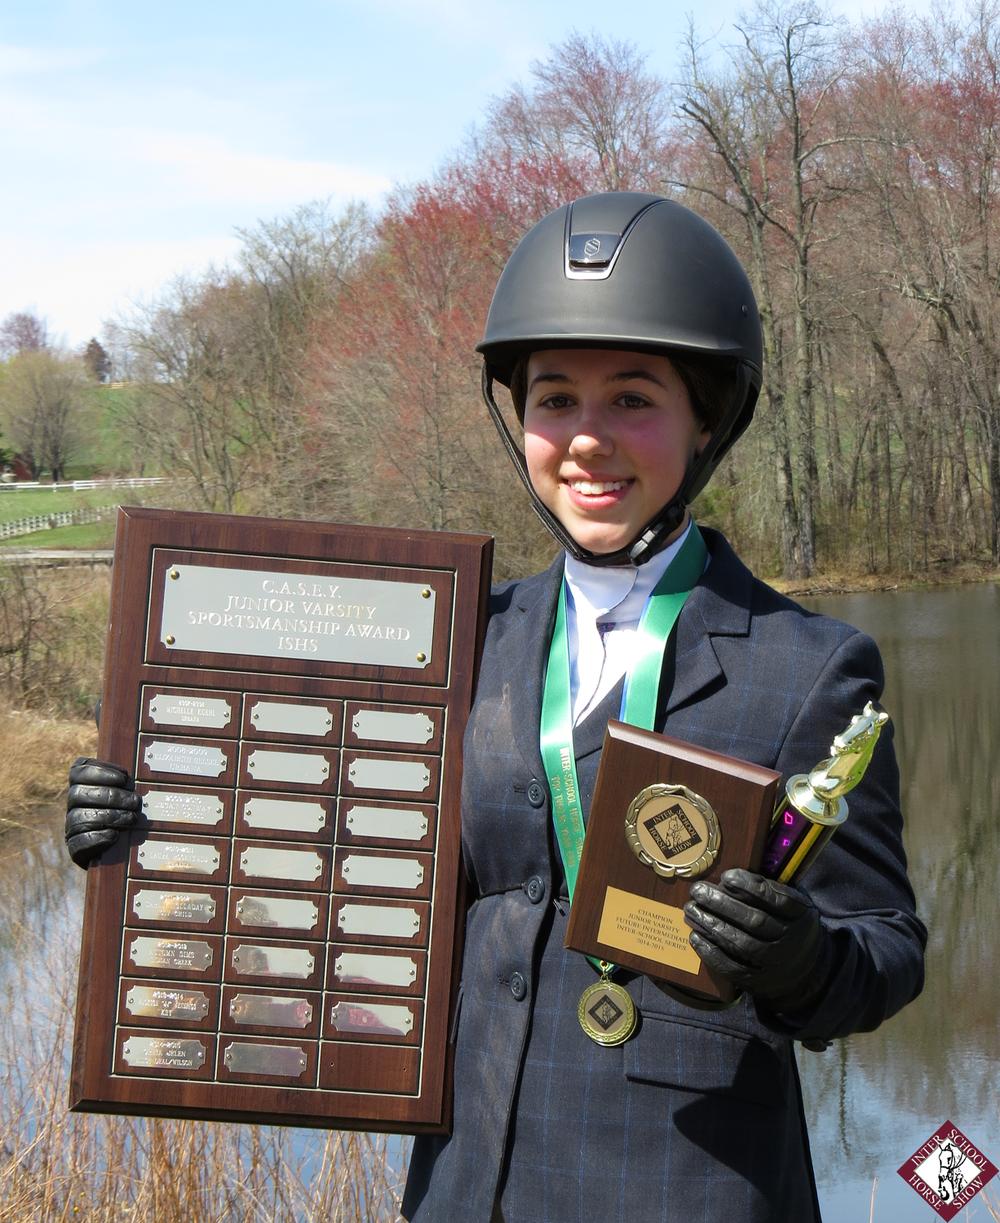 ISHS 2014C.A.S.E.Y. Sportsmanship Award winner